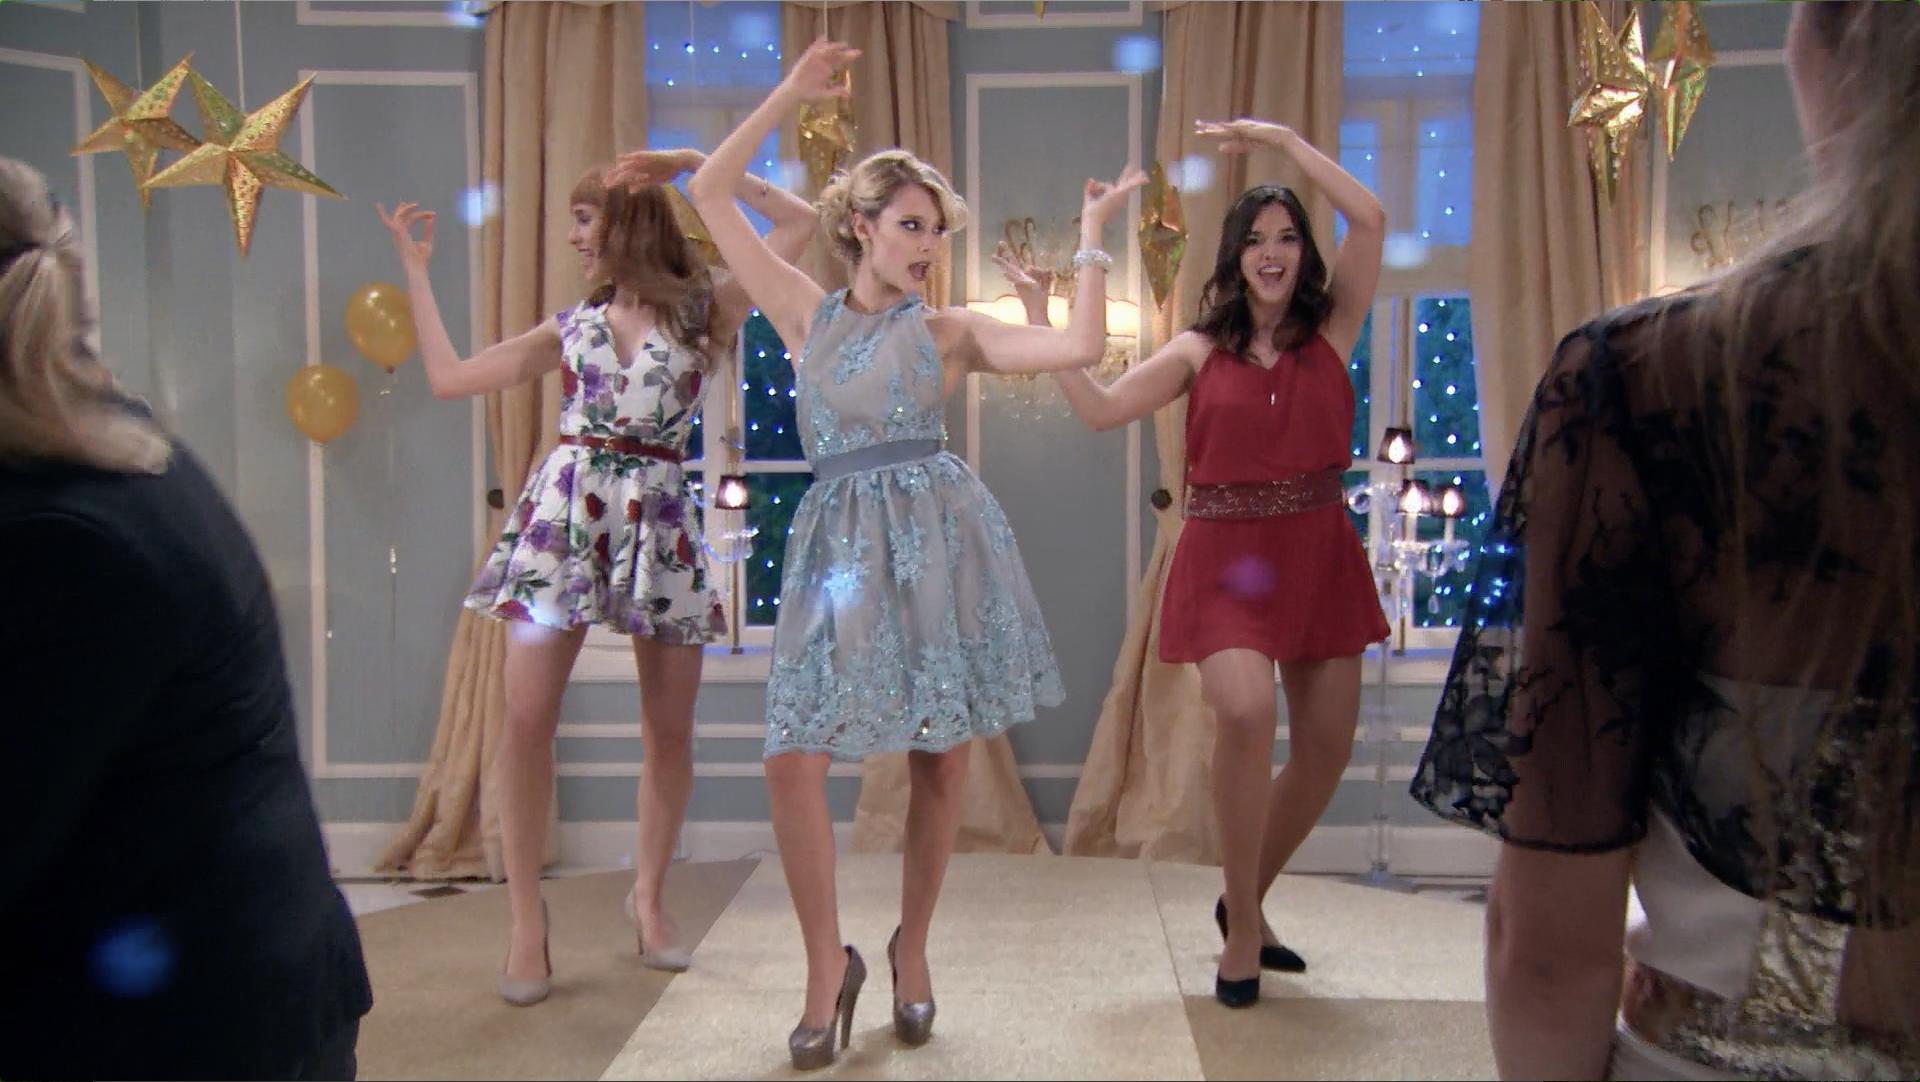 Ámbar, Delfina y Jazmín cantan Chicas así - Momento Musical - Soy Luna